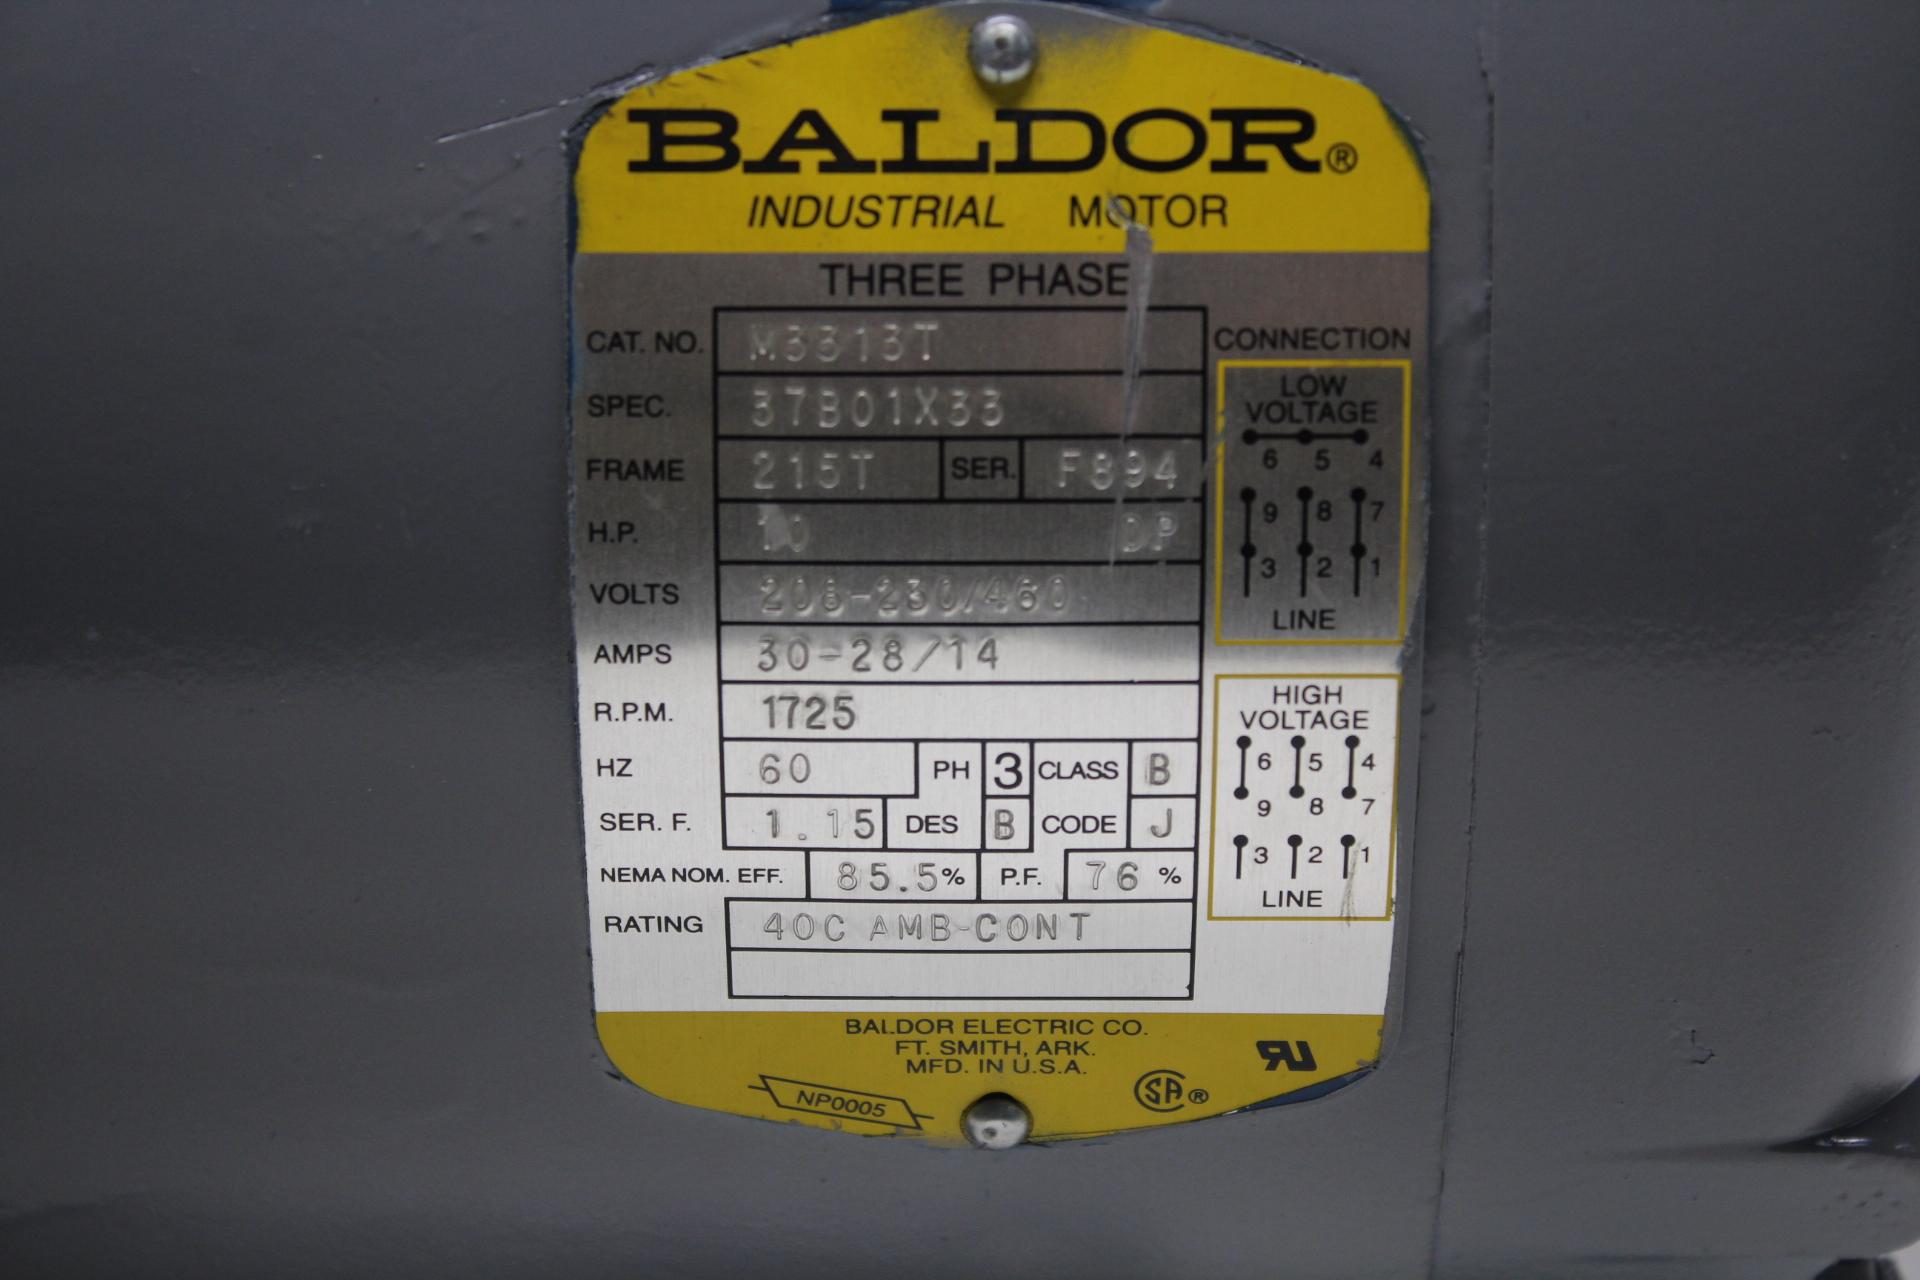 Baldor Motor M3313t  3ph  10 Hp  215t Frame  1725 Rpm  Volts 208 460